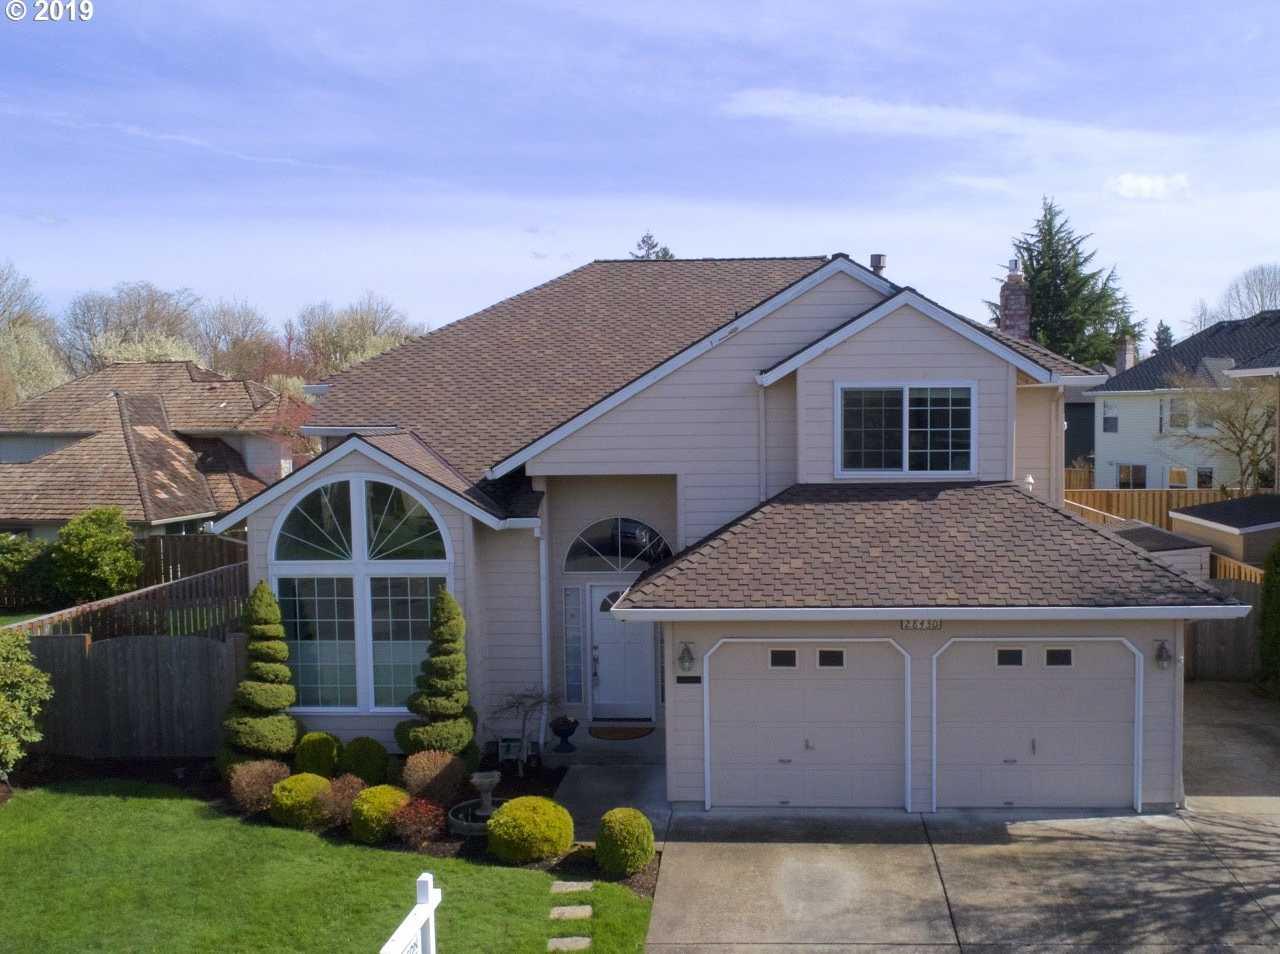 $495,000 - 4Br/3Ba -  for Sale in Wilsonville Meadows, Wilsonville